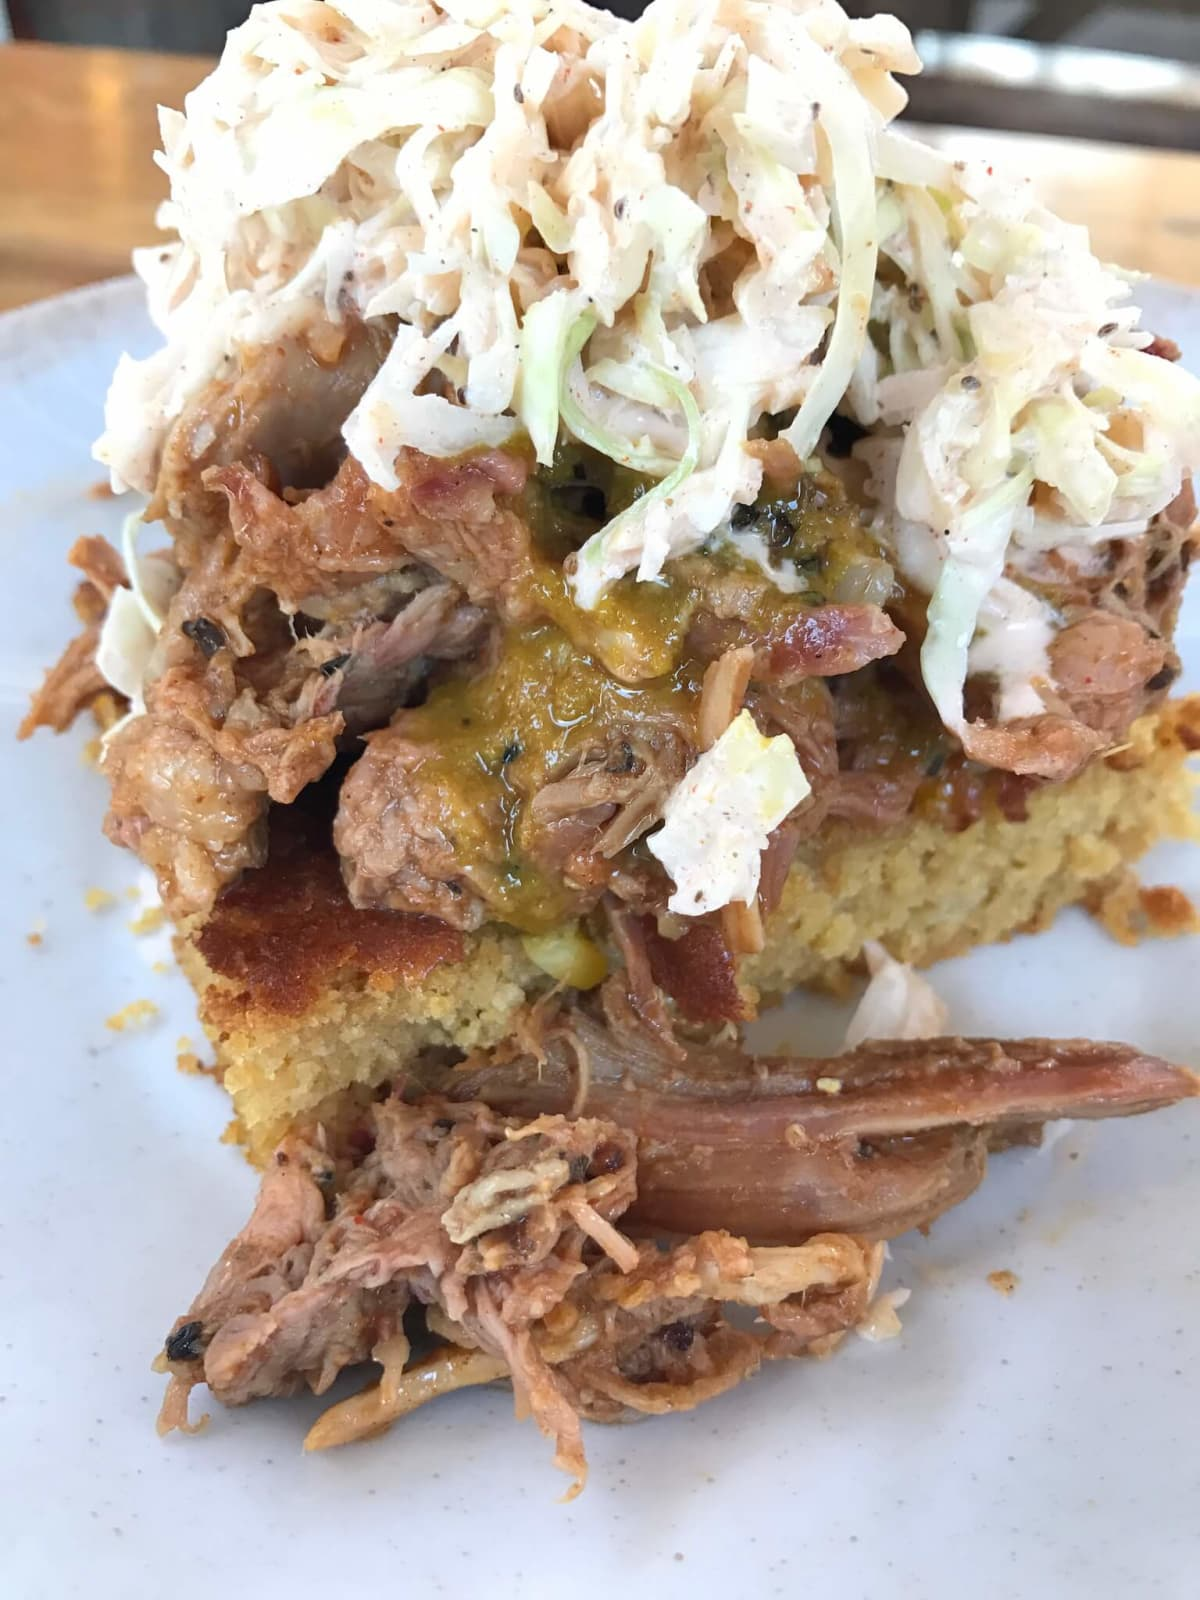 Patrick Feges whole hog barbecue bbq pulled pork cornbread